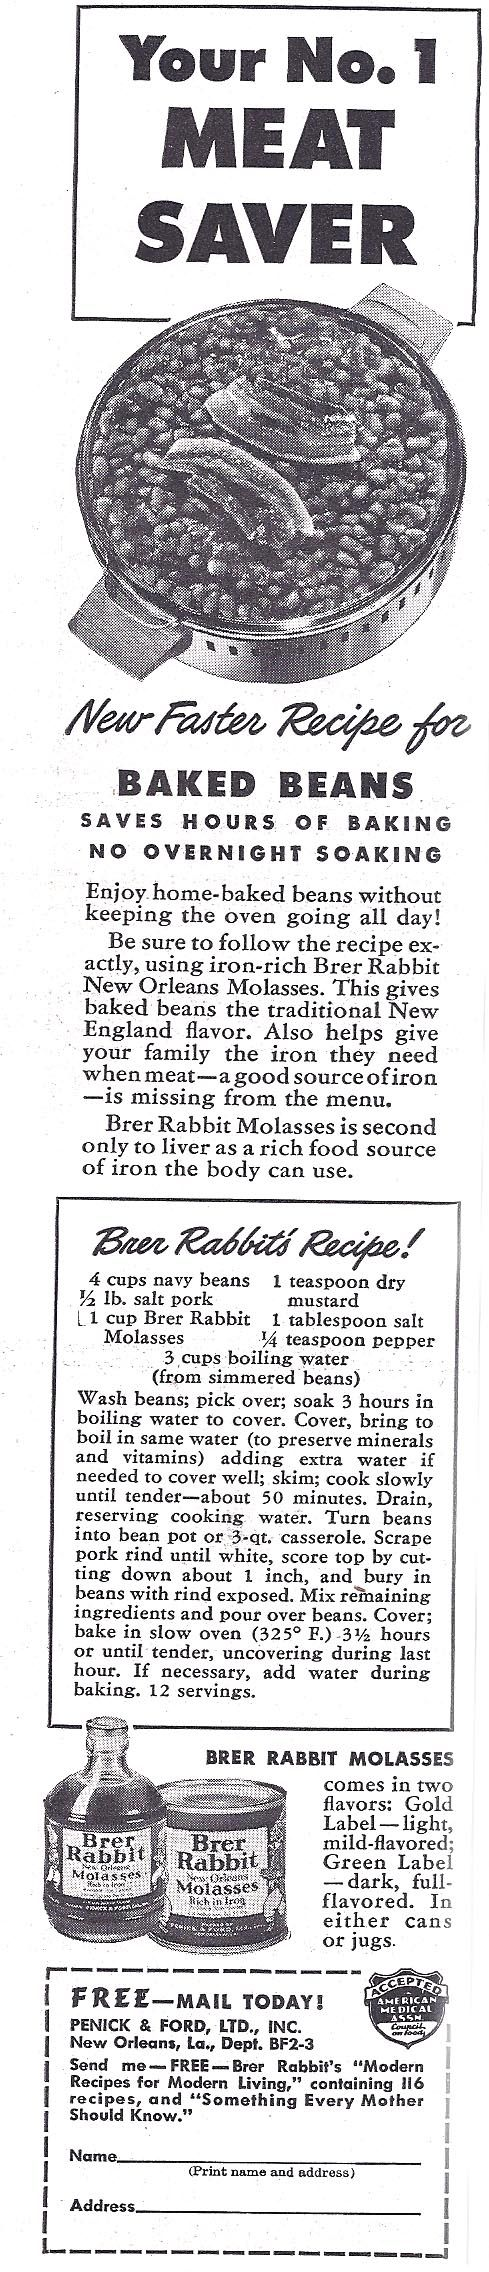 96 best wartime cooking images on pinterest vintage food vintage 1943 recipe for brer rabbit baked beans during world war ii food related advertising forumfinder Gallery